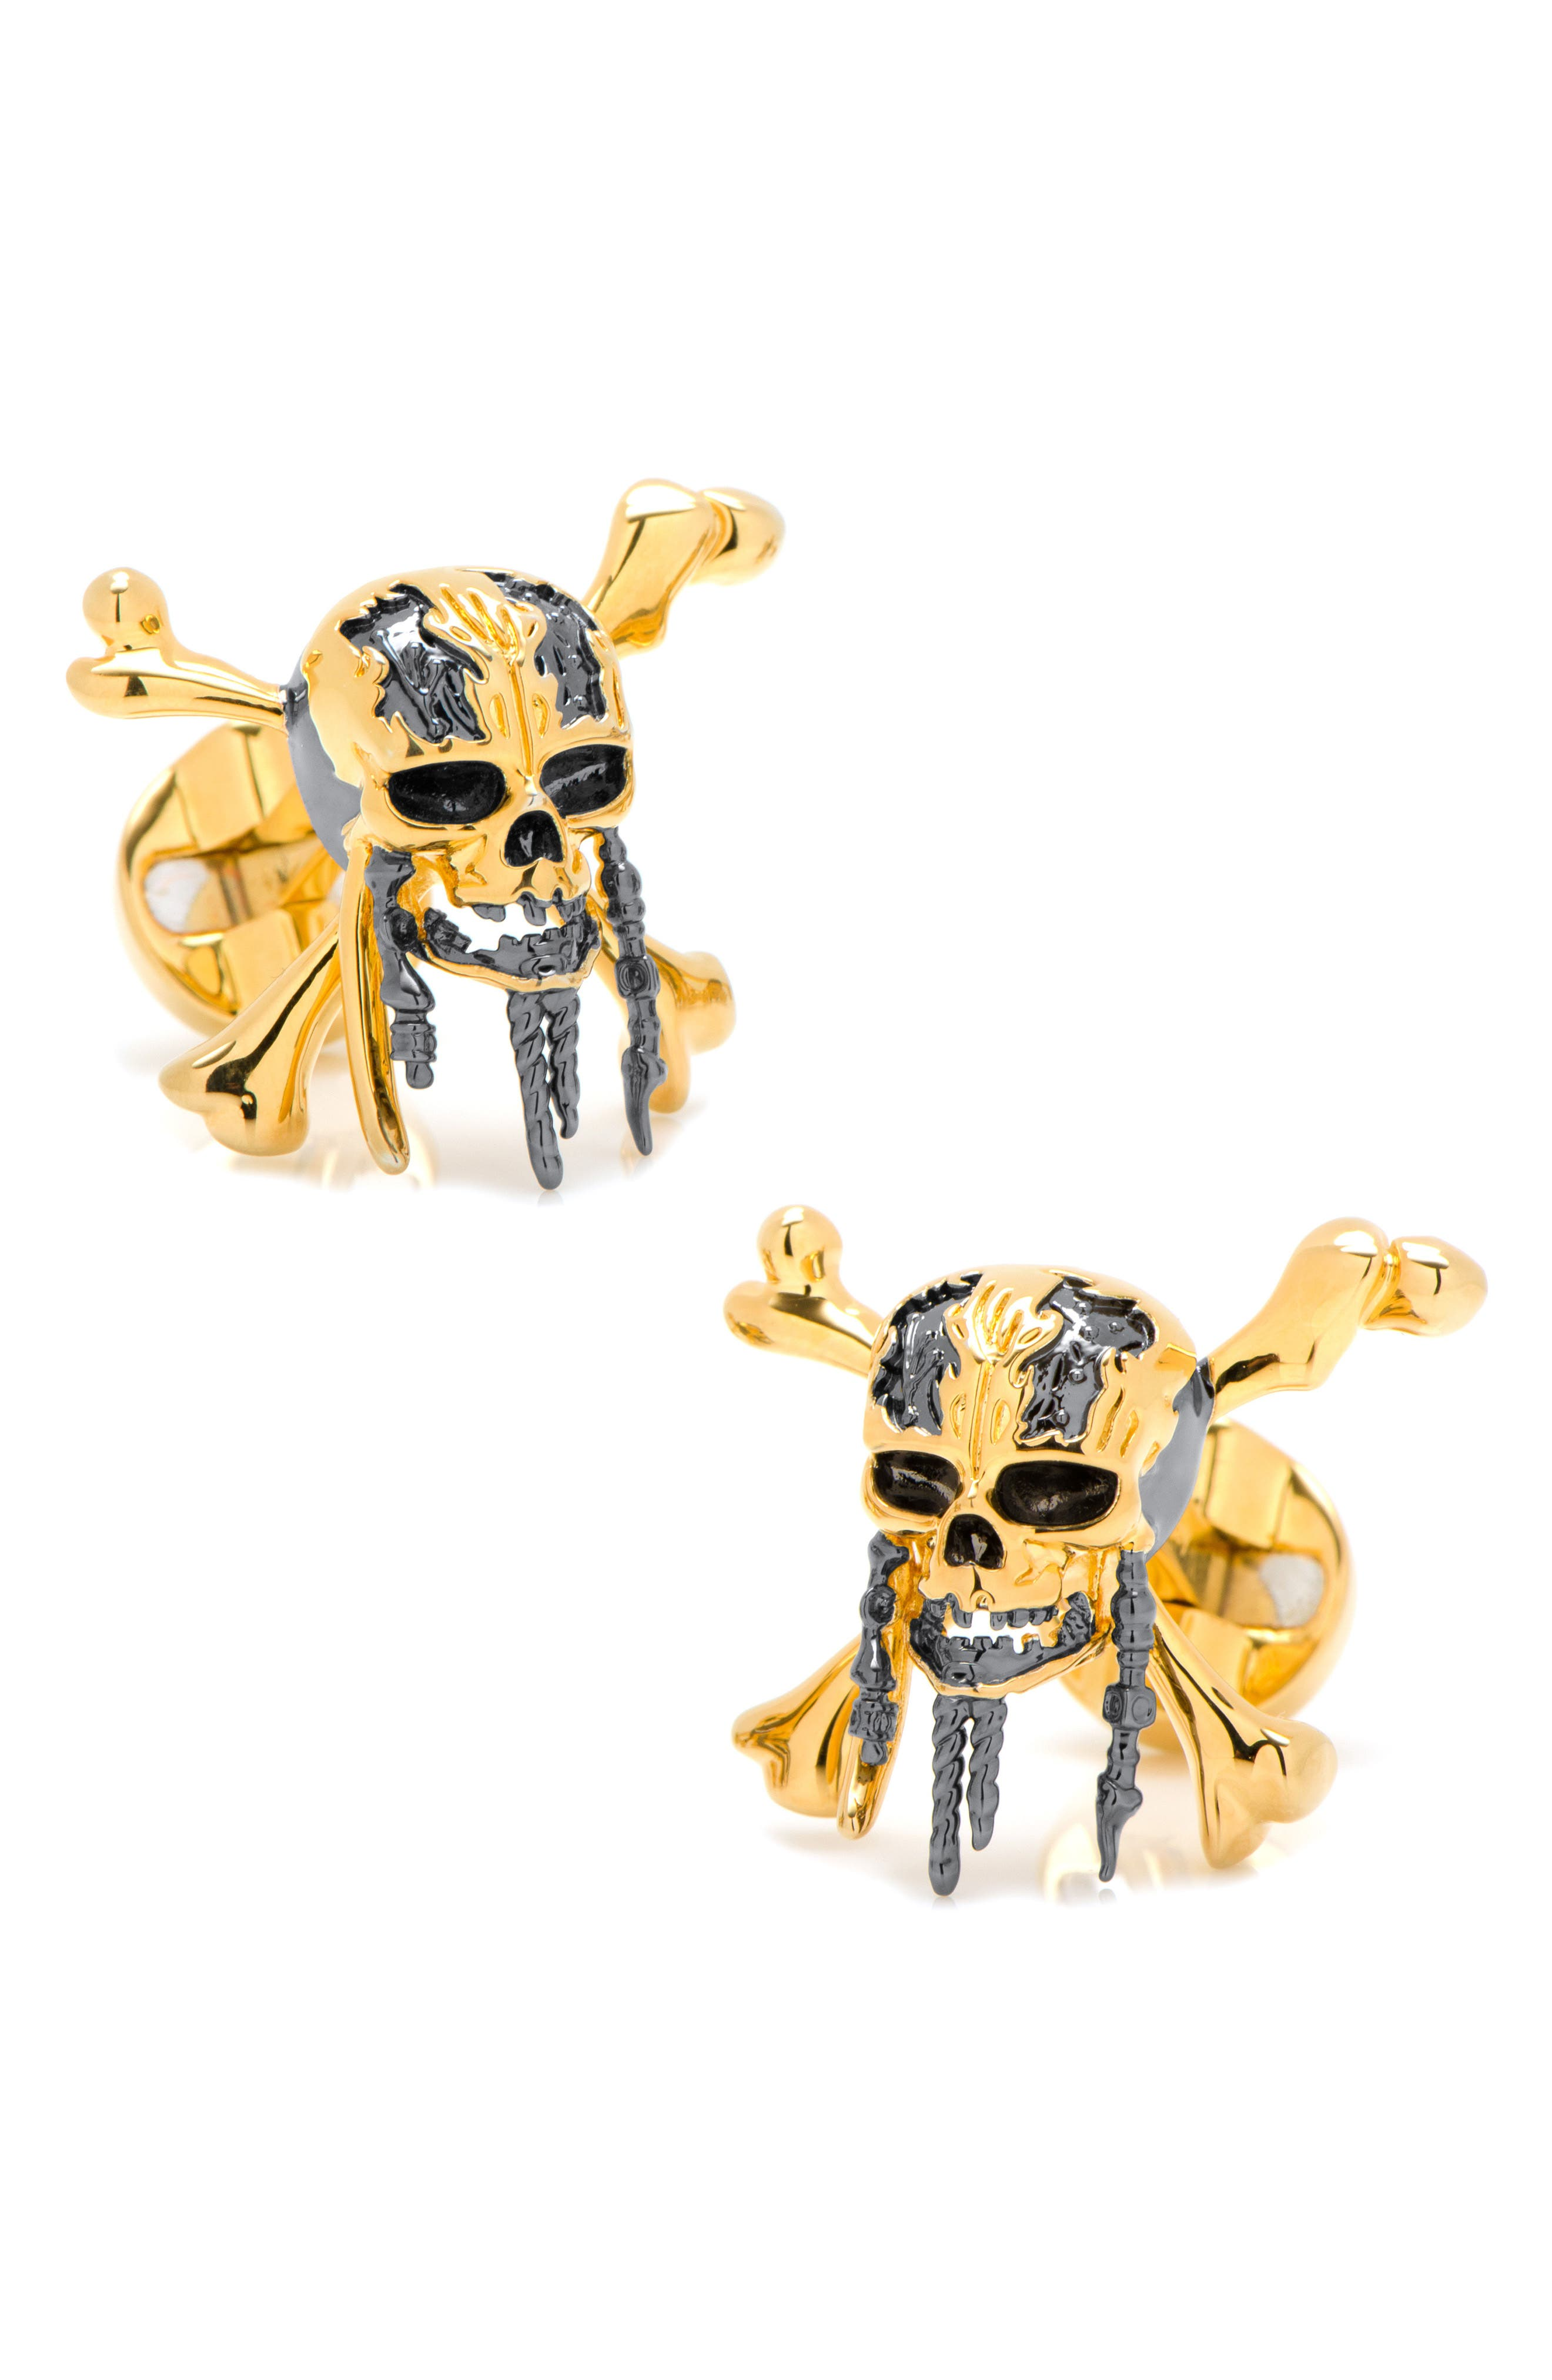 Pirates 3D Skull Cuff Links,                             Main thumbnail 1, color,                             006